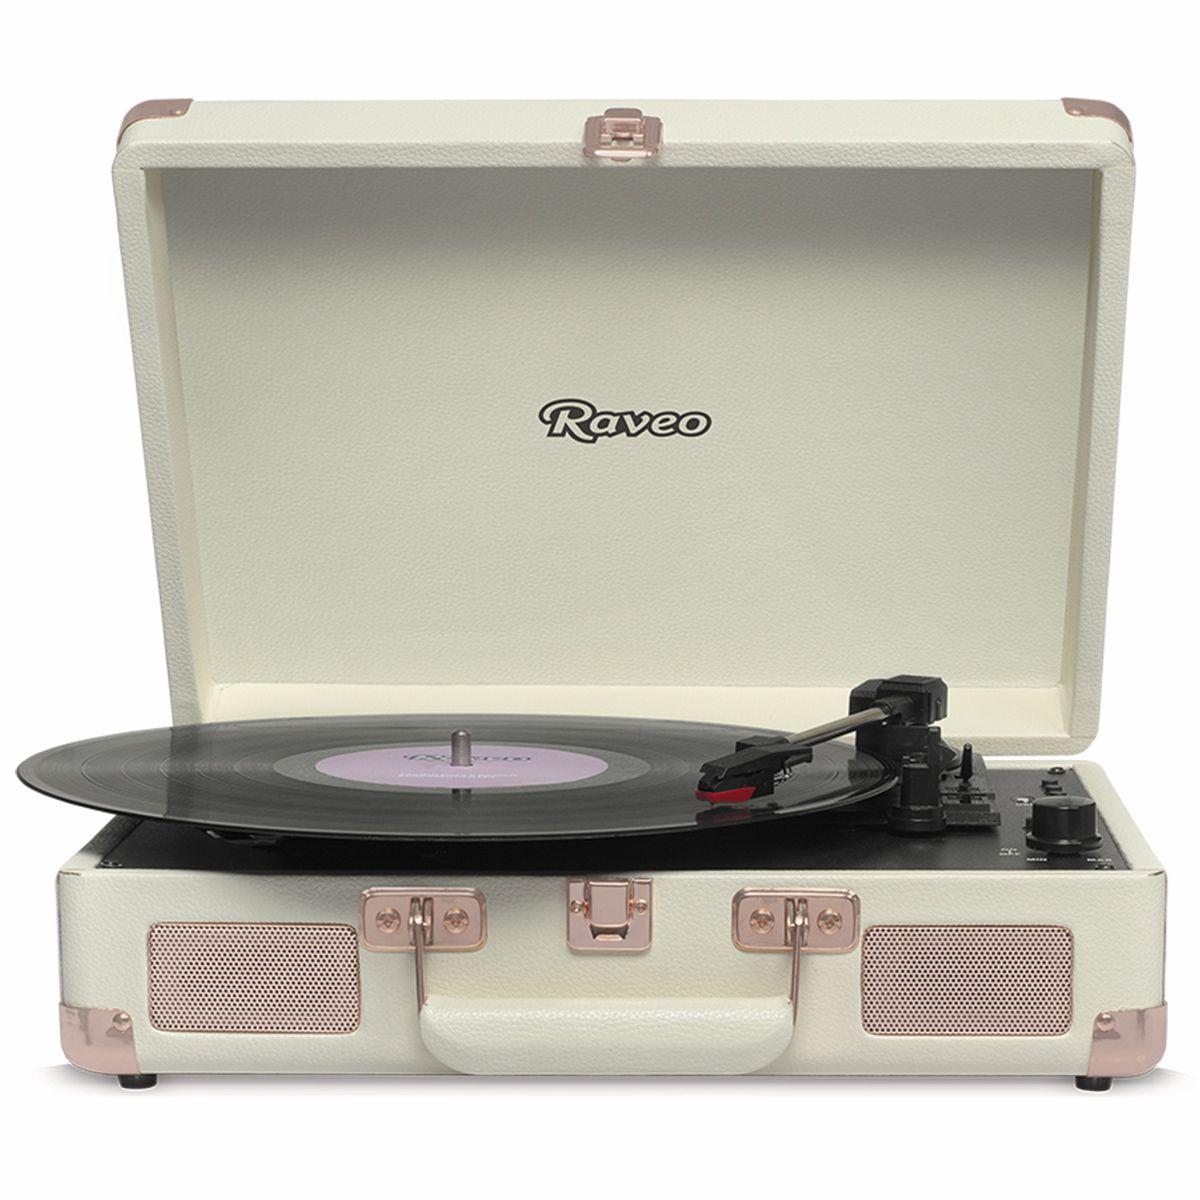 Vitrola Raveo Sonetto Rose Gold c/ Toca Disco, bluetooth, USB Rec Selo Anatel